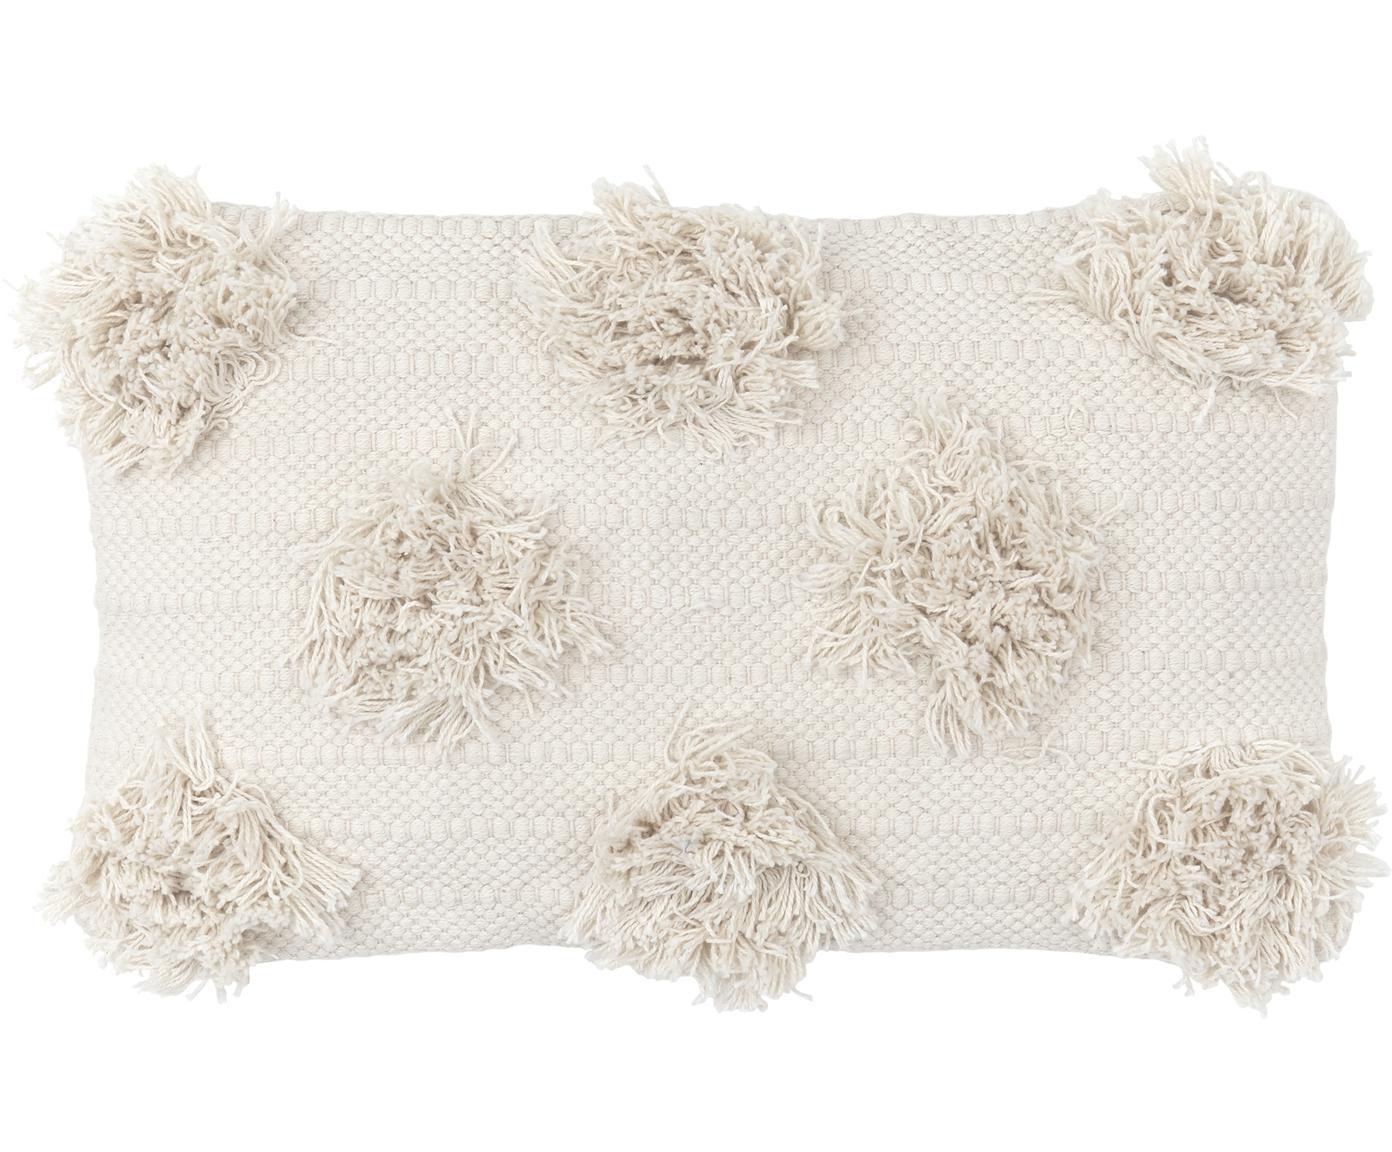 Kissenhülle Vana, Baumwolle, Ecru, 30 x 50 cm